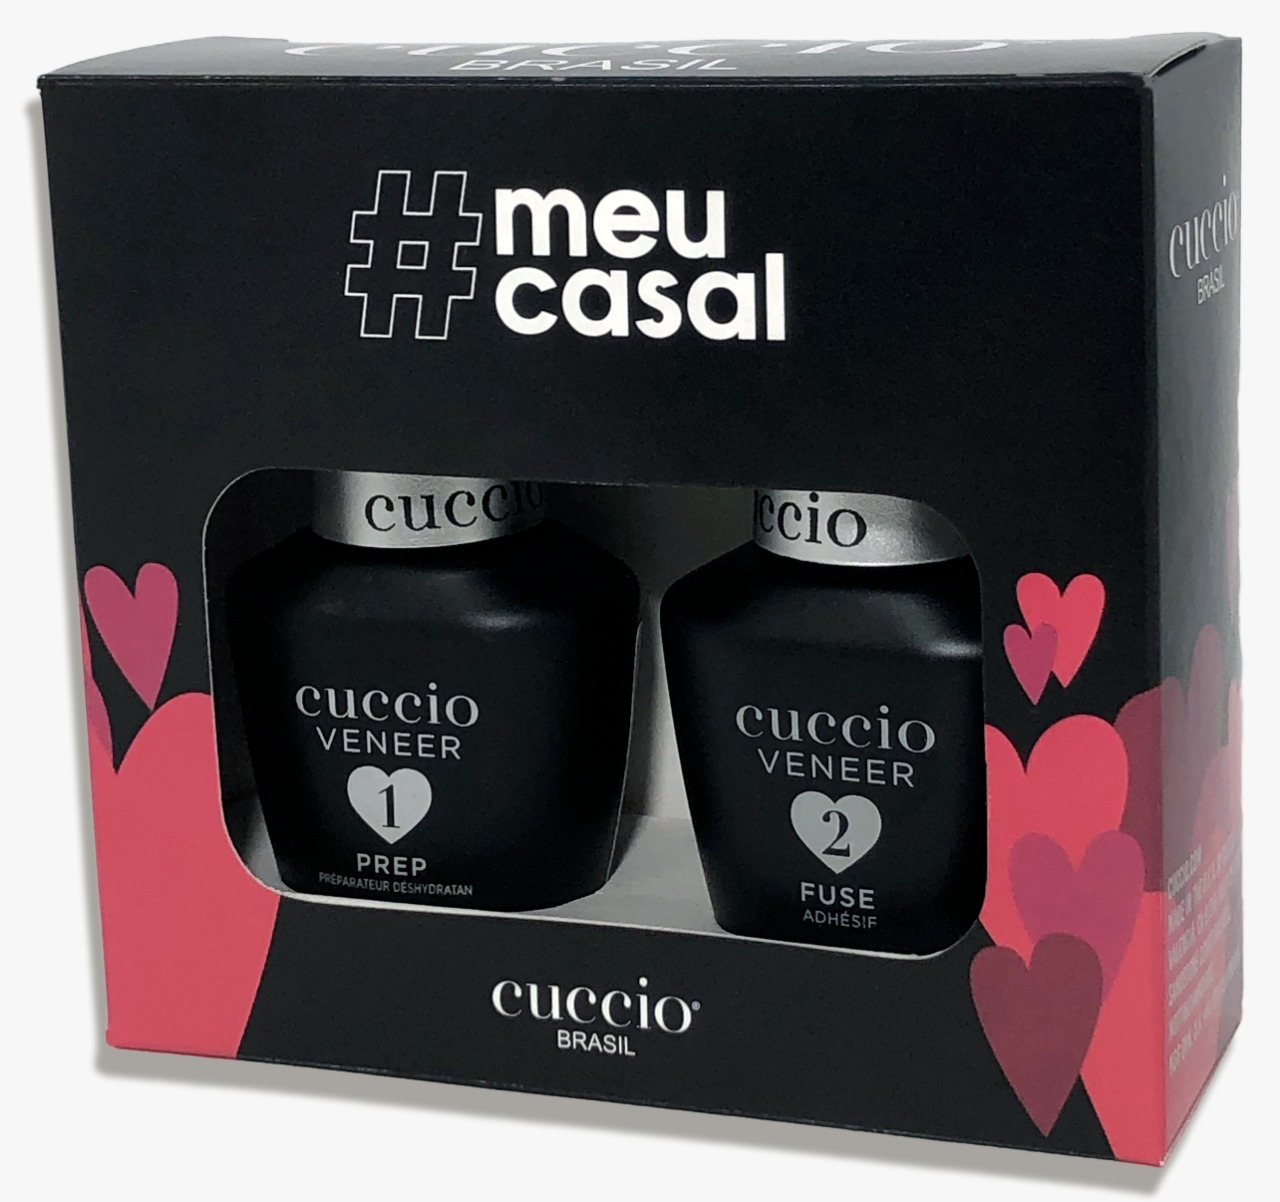 Kit Meu Casal Cuccio Pro (Prep 13ml + Fuse 13ml)